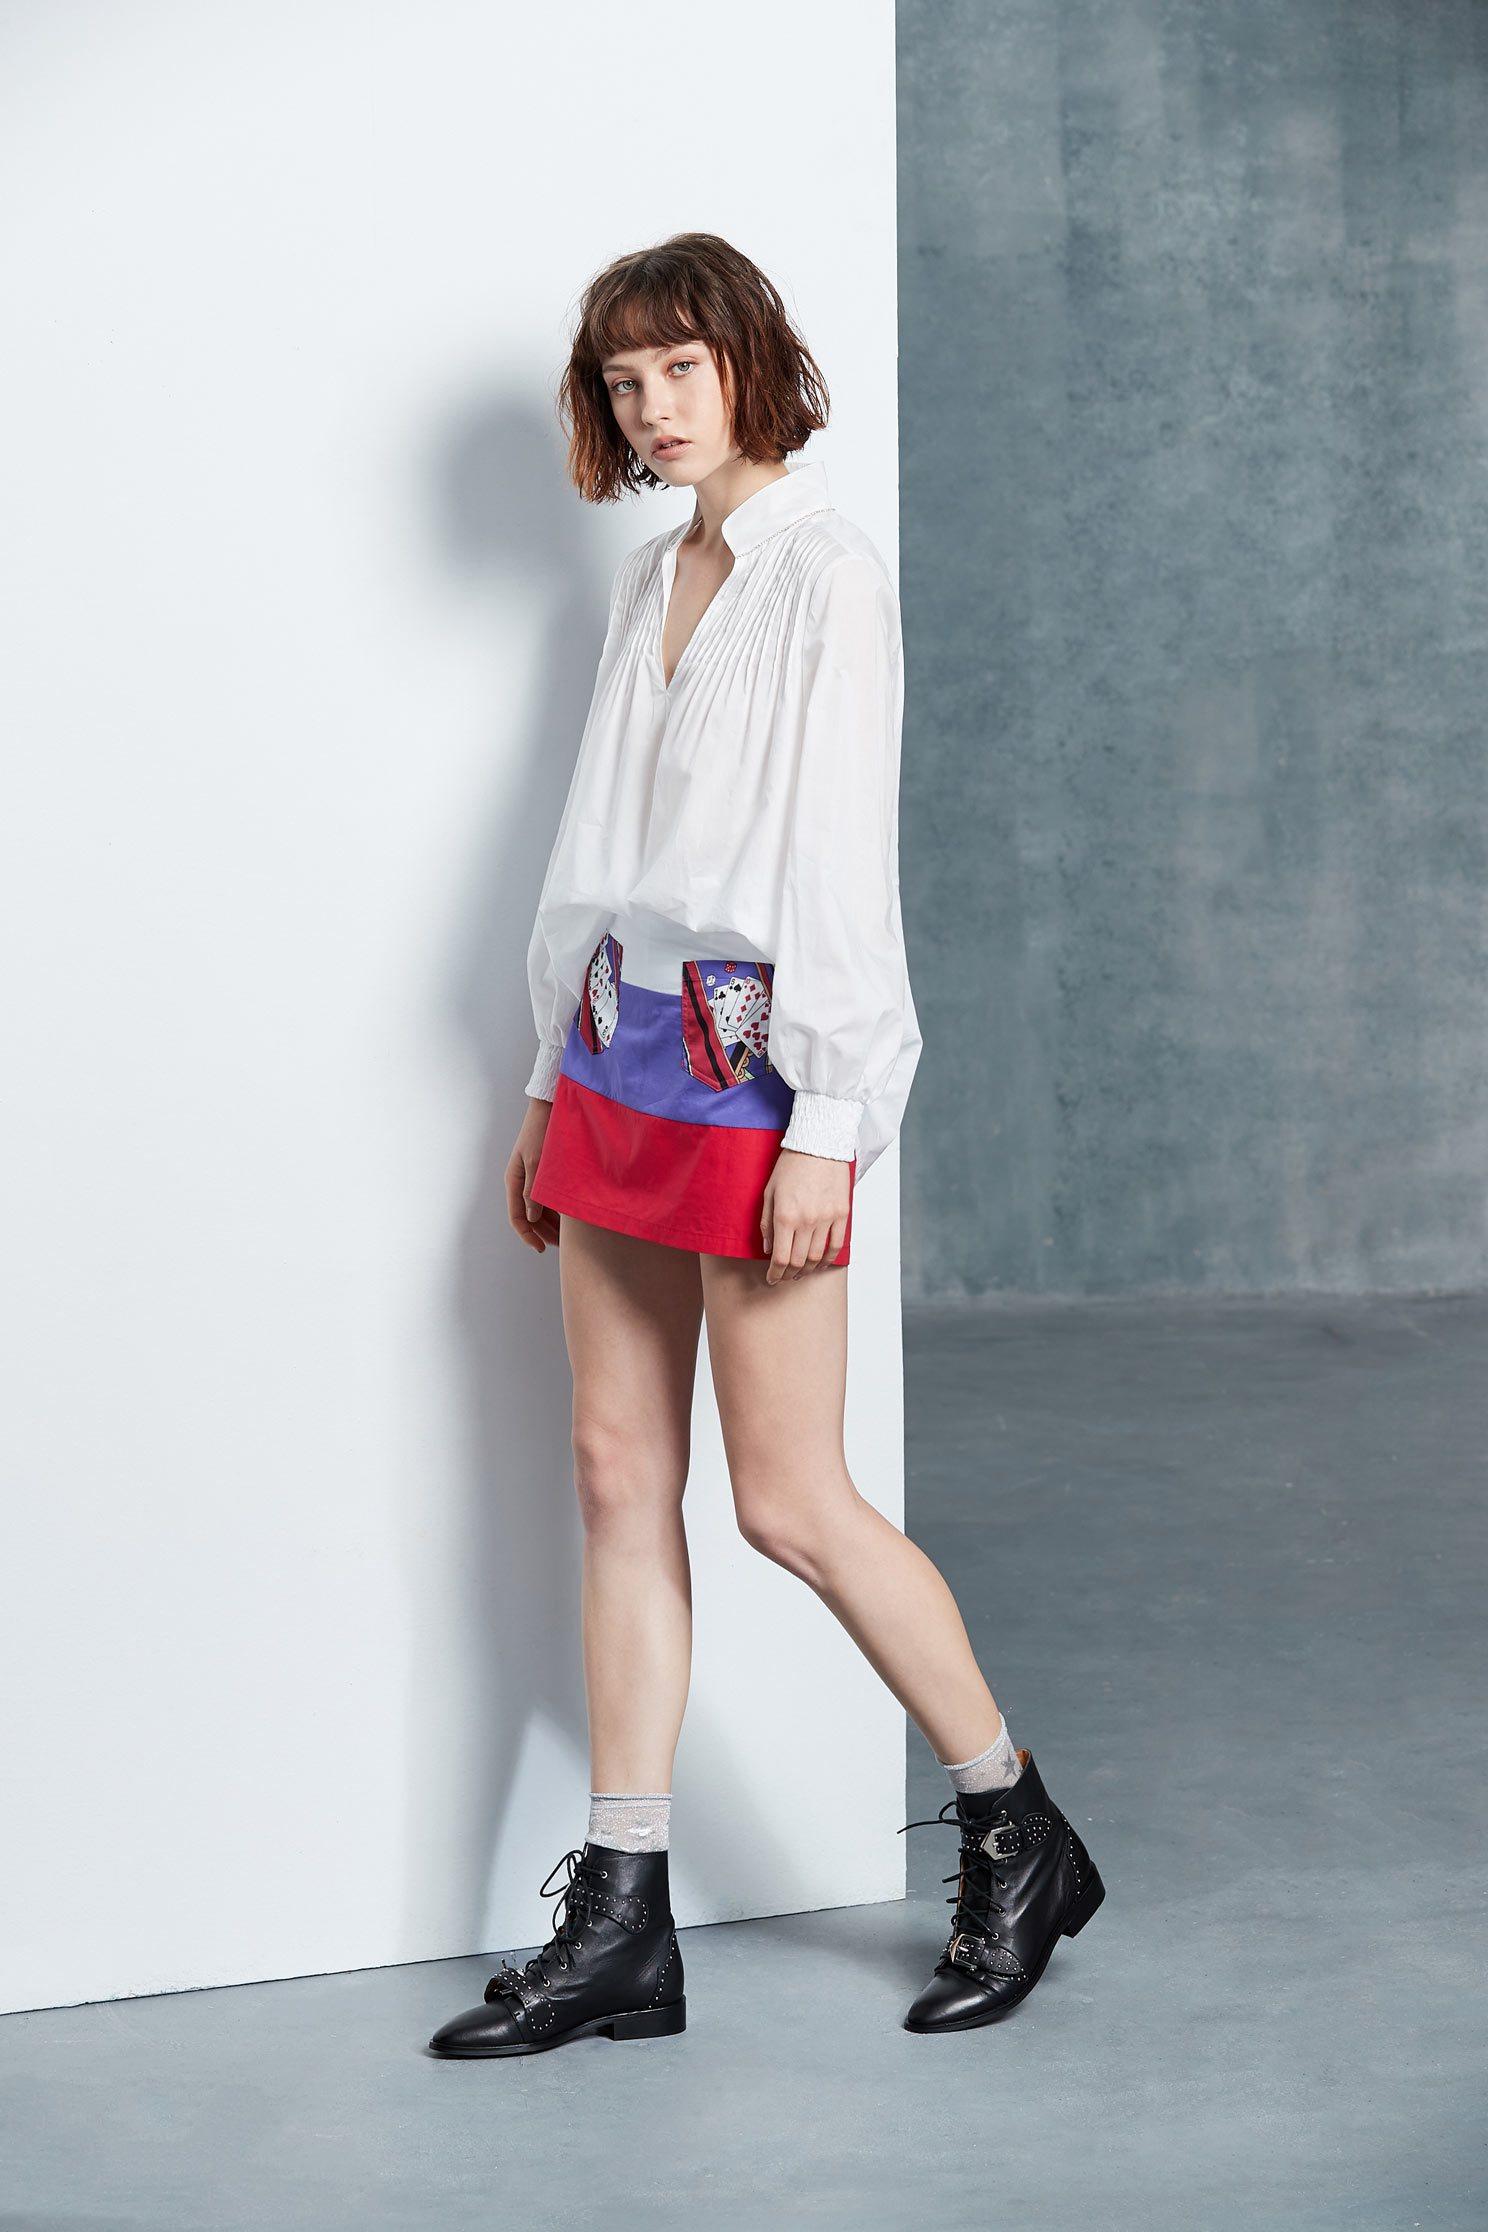 Elegant fashion long-sleeved top